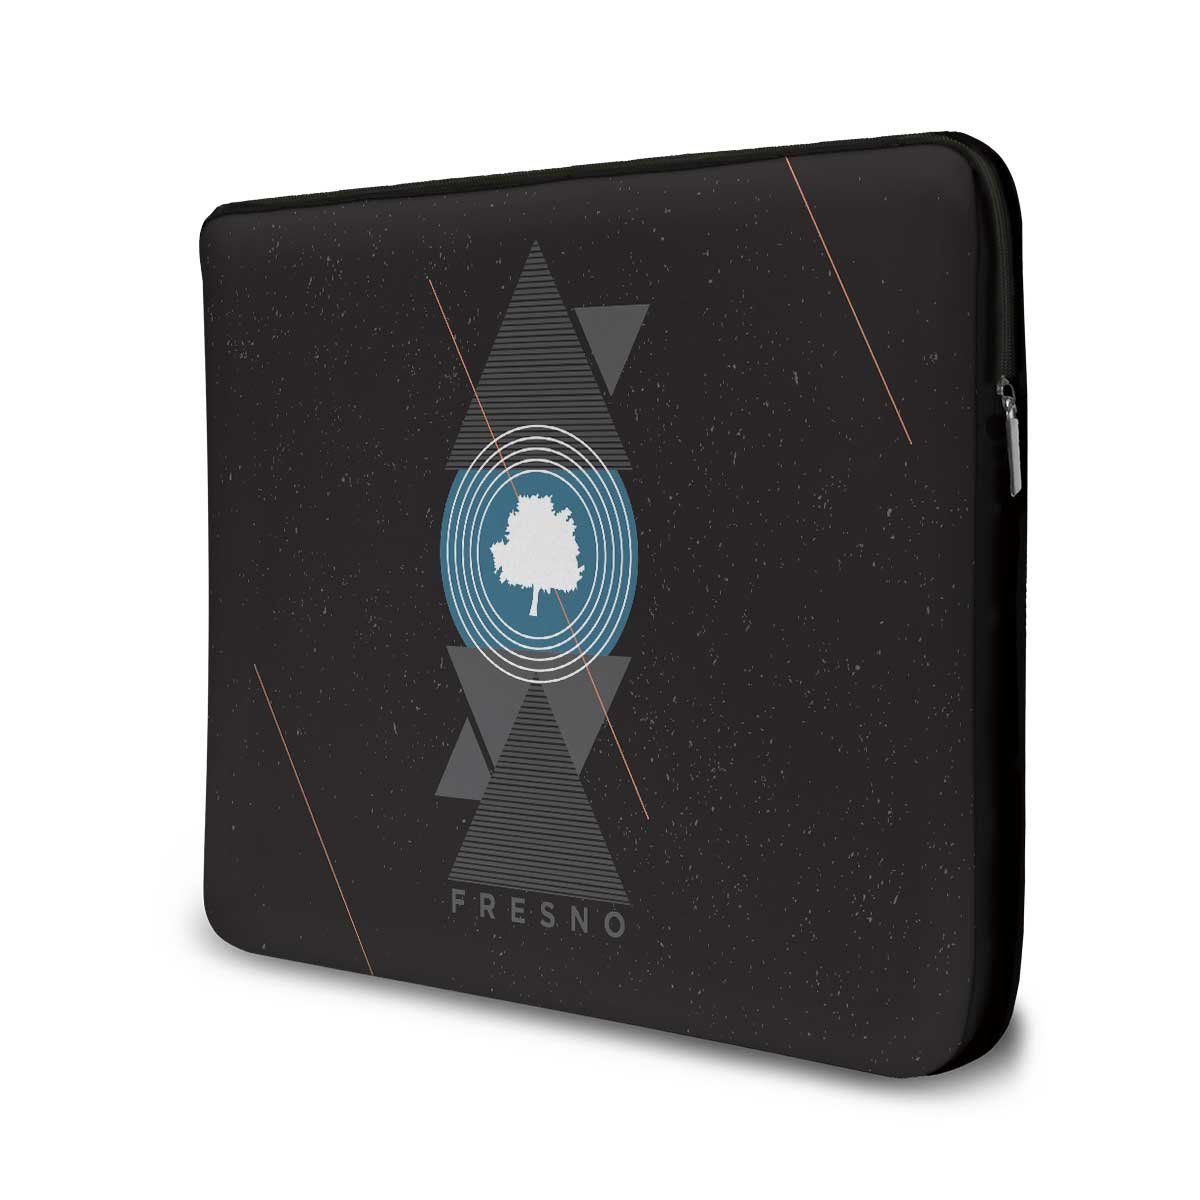 Capa para Notebook Fresno Geometric